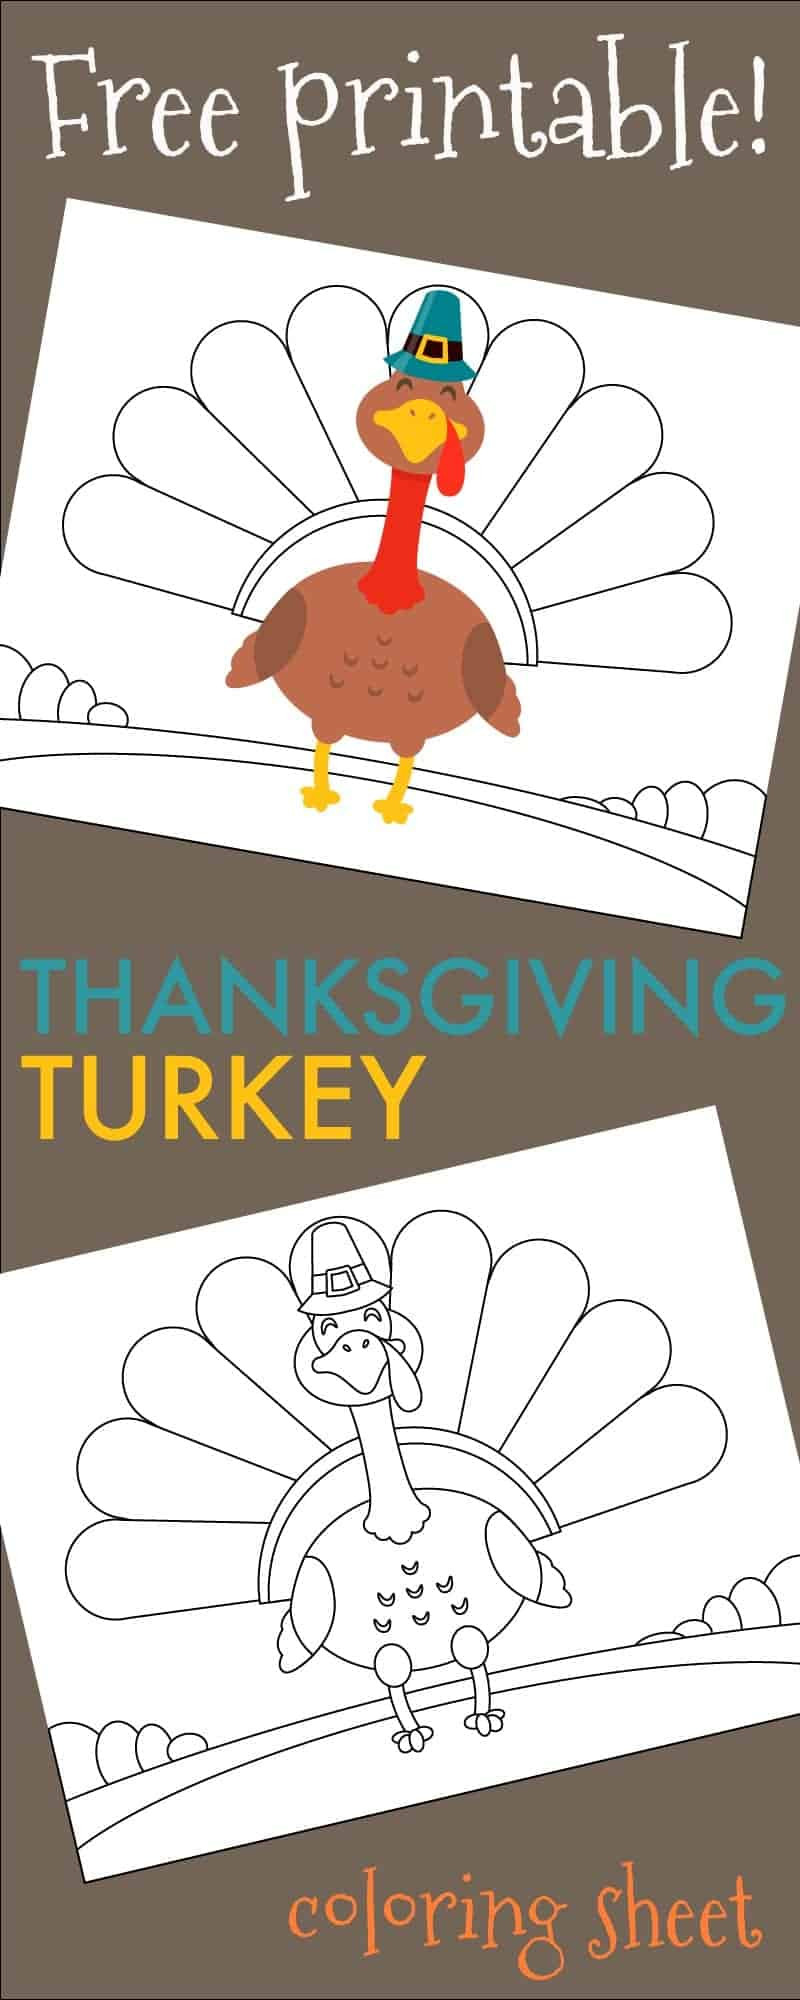 Thanksgiving Turkey Printable  Thanksgiving Turkey Coloring Sheet Free Printable 730